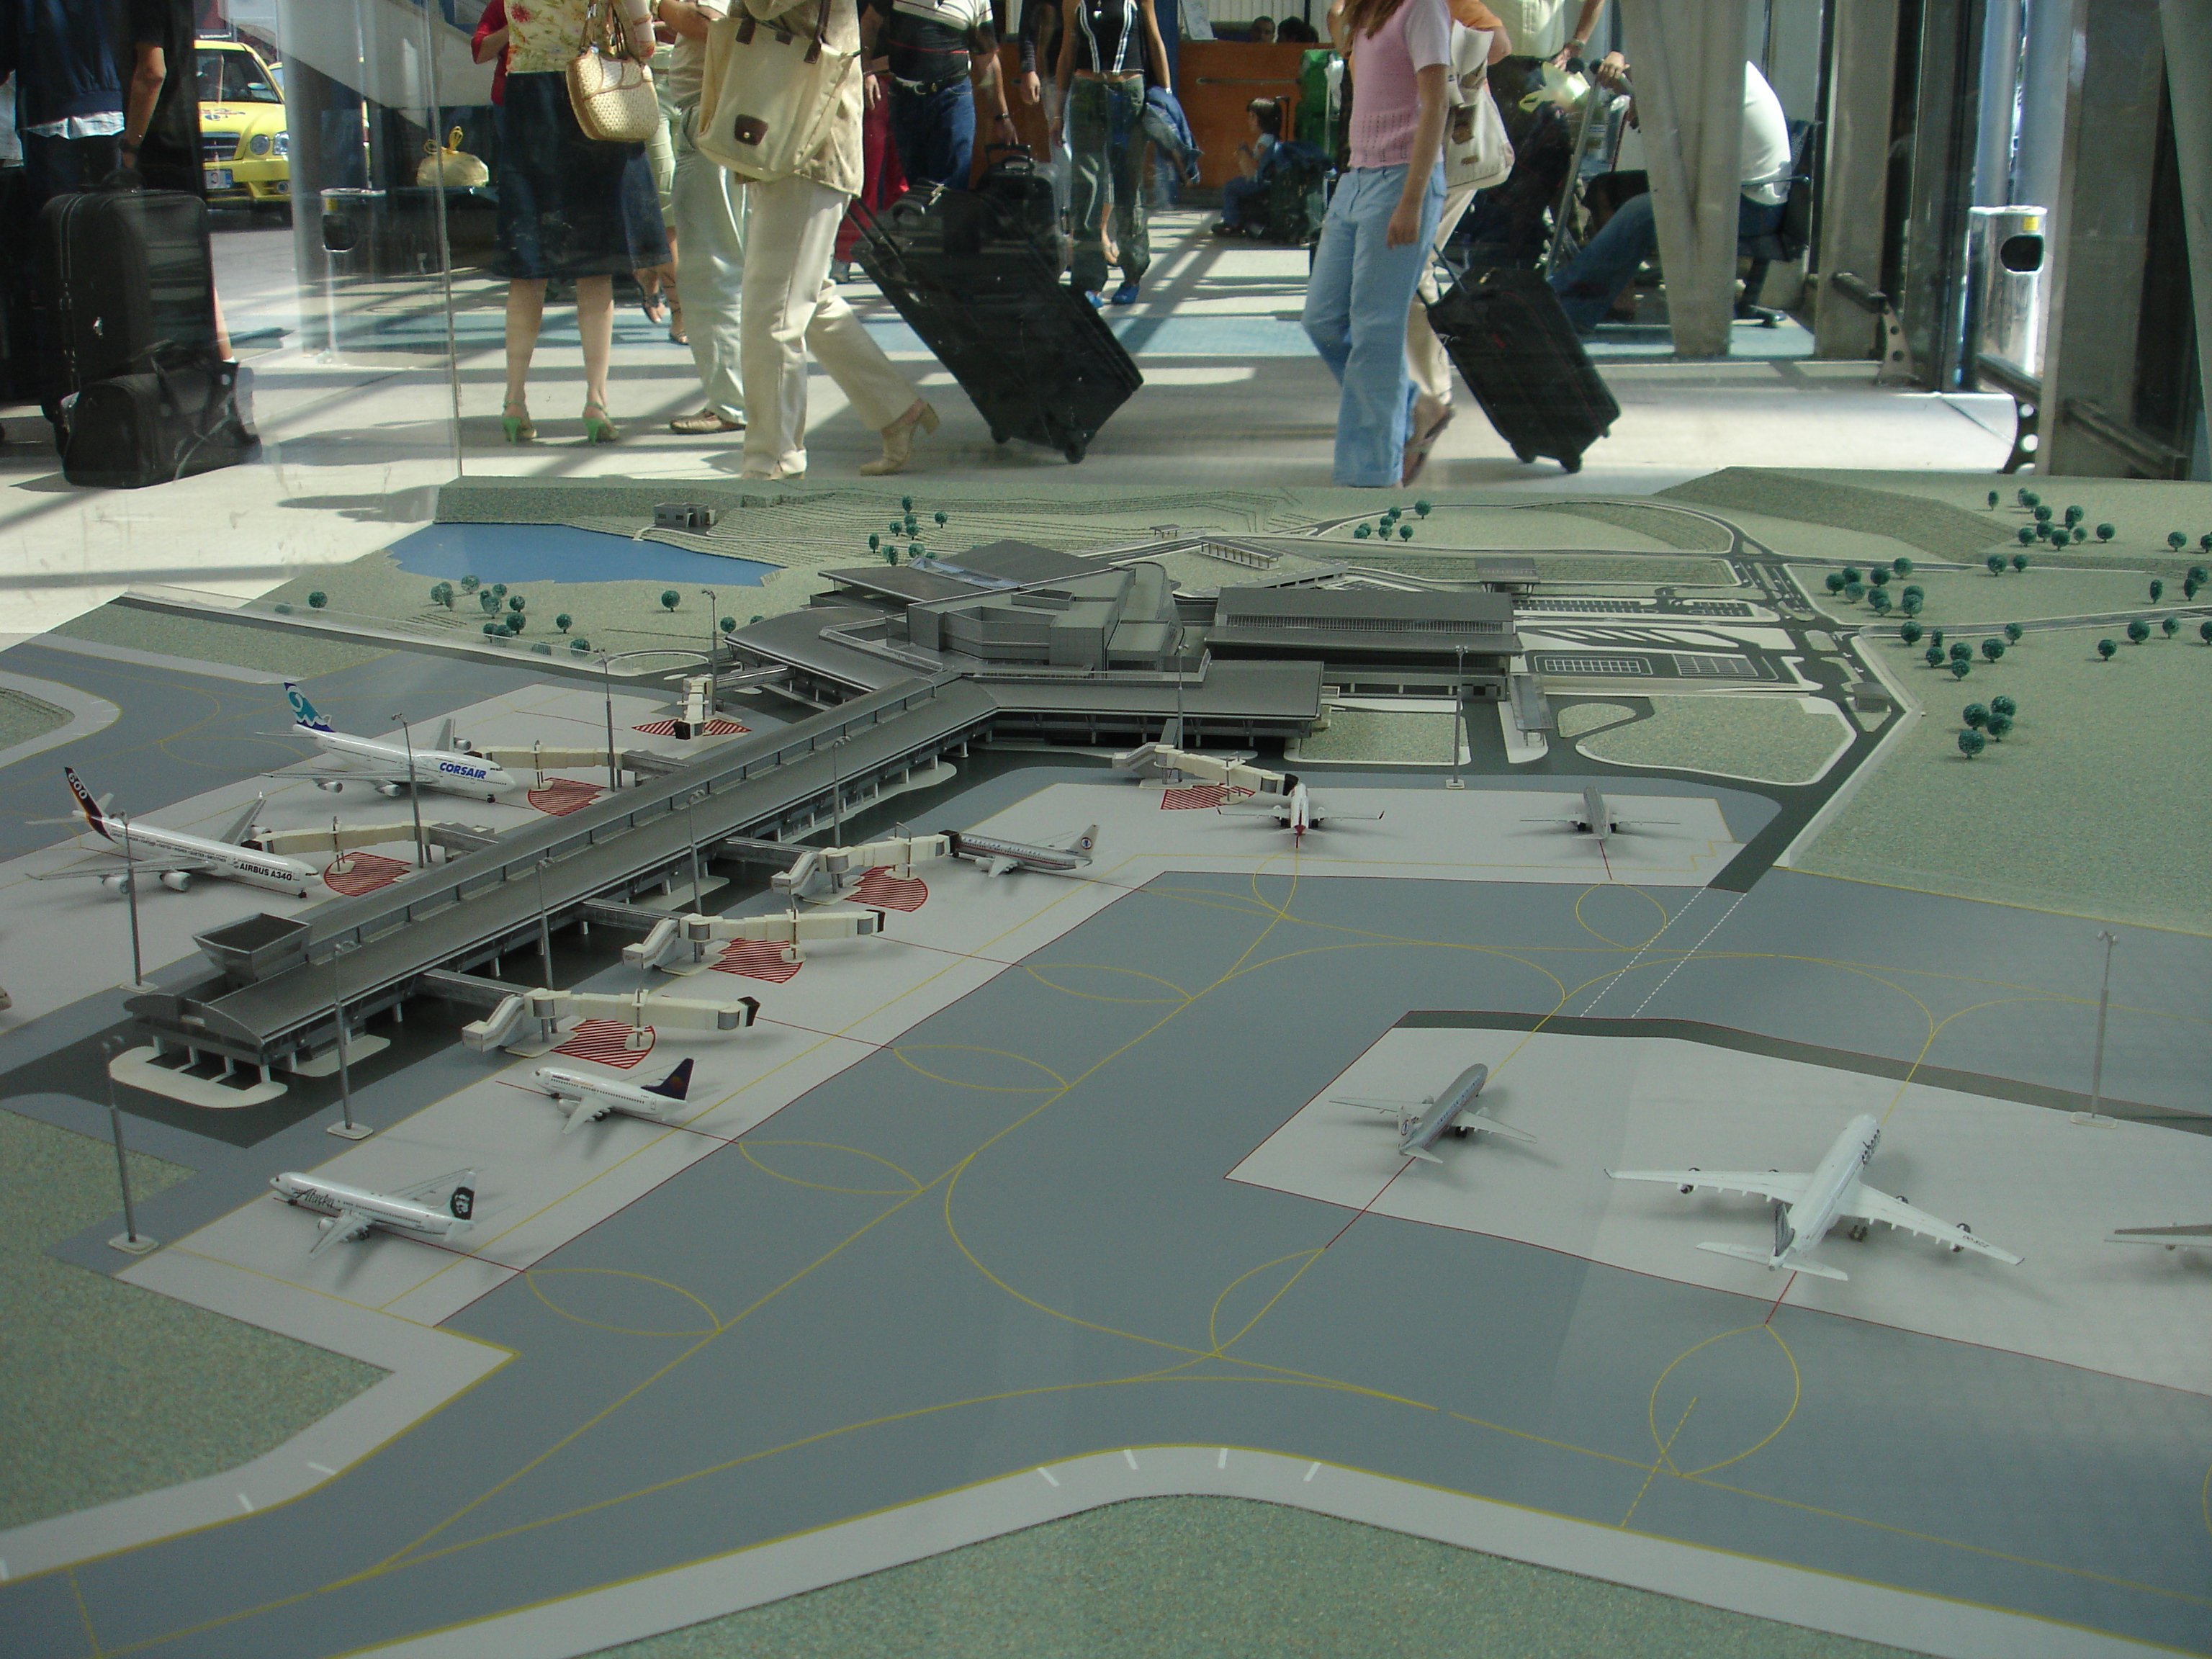 File:Sofia Airport model.jpg